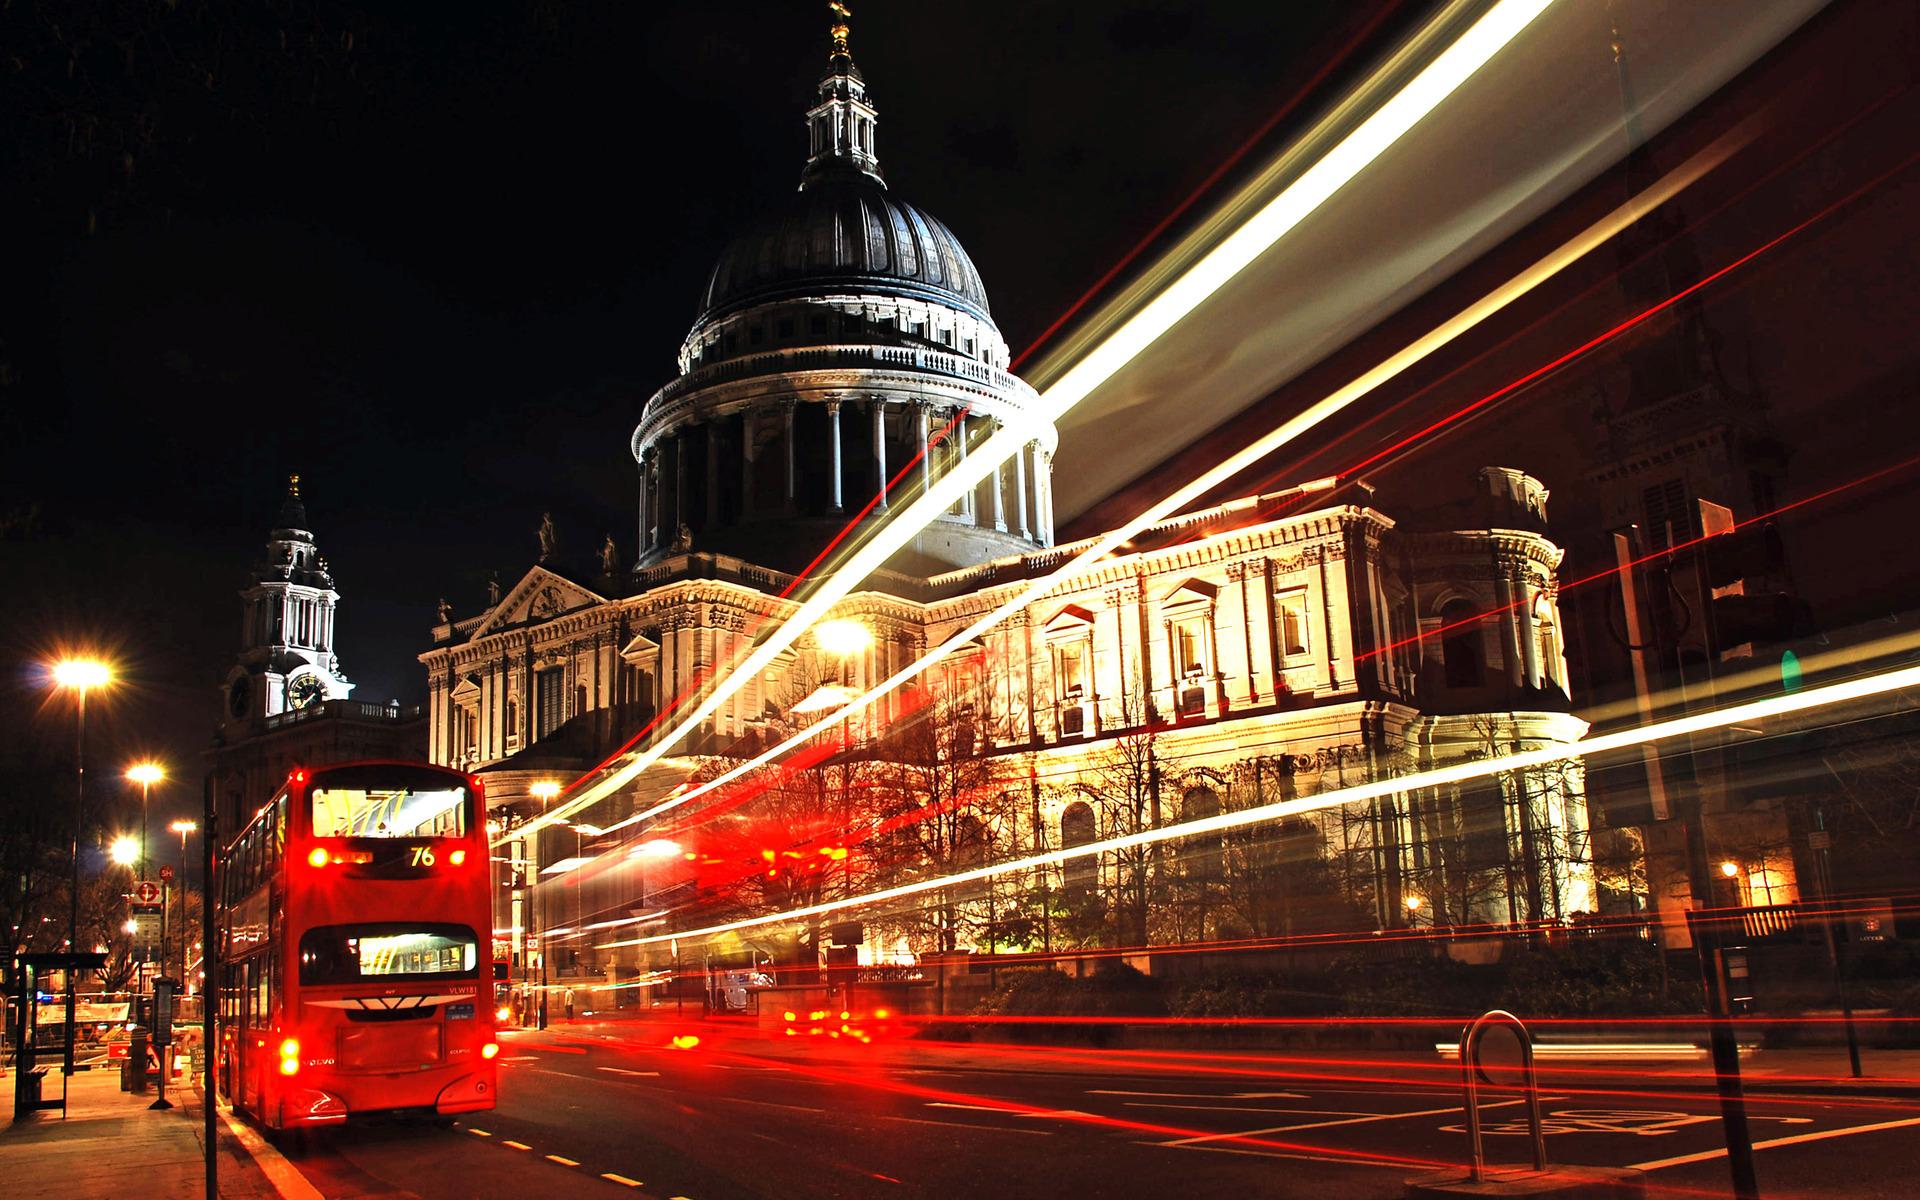 London Wallpapers HD road bus